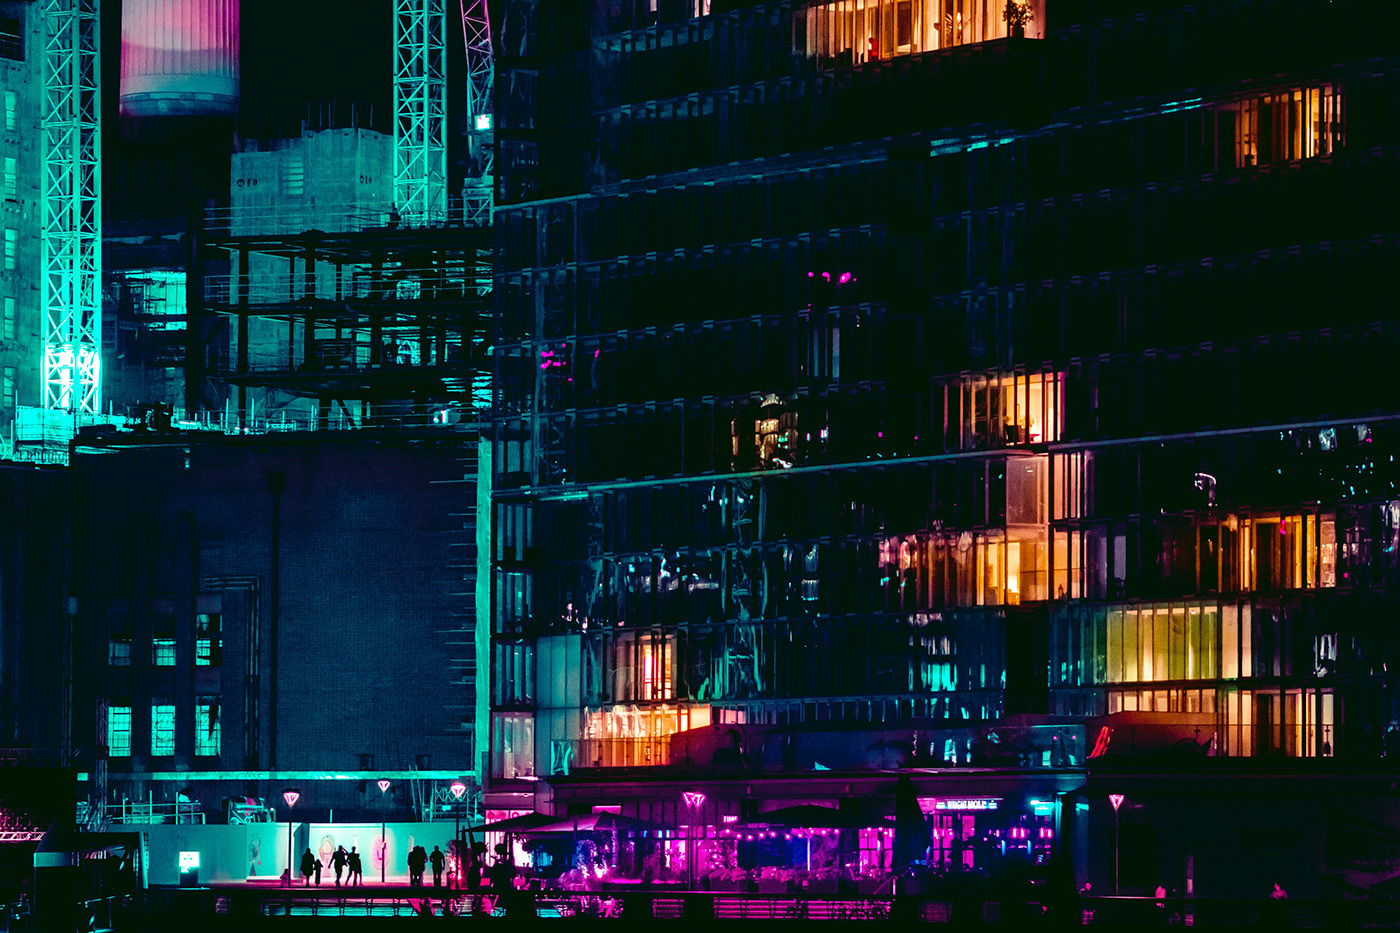 Cyberpunk future London neon neon london neon street photography Street